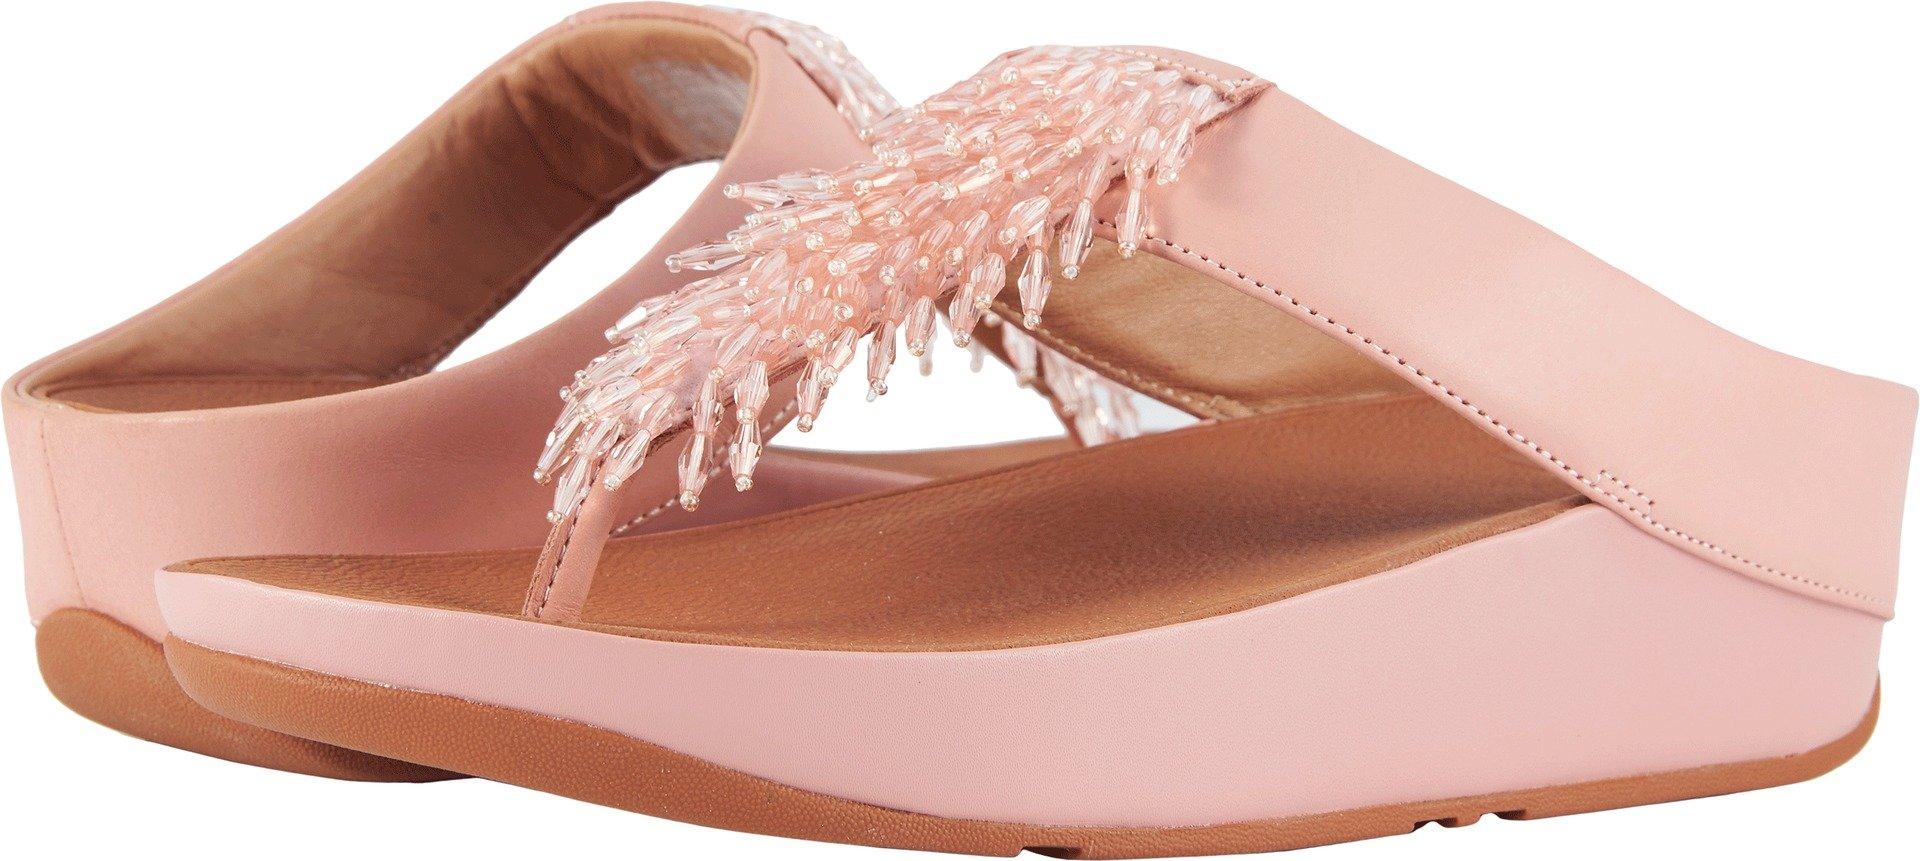 b76eb4ec193f Galleon - FitFlop Women s Rumba Toe Thong Sandals Dusky Pink 8